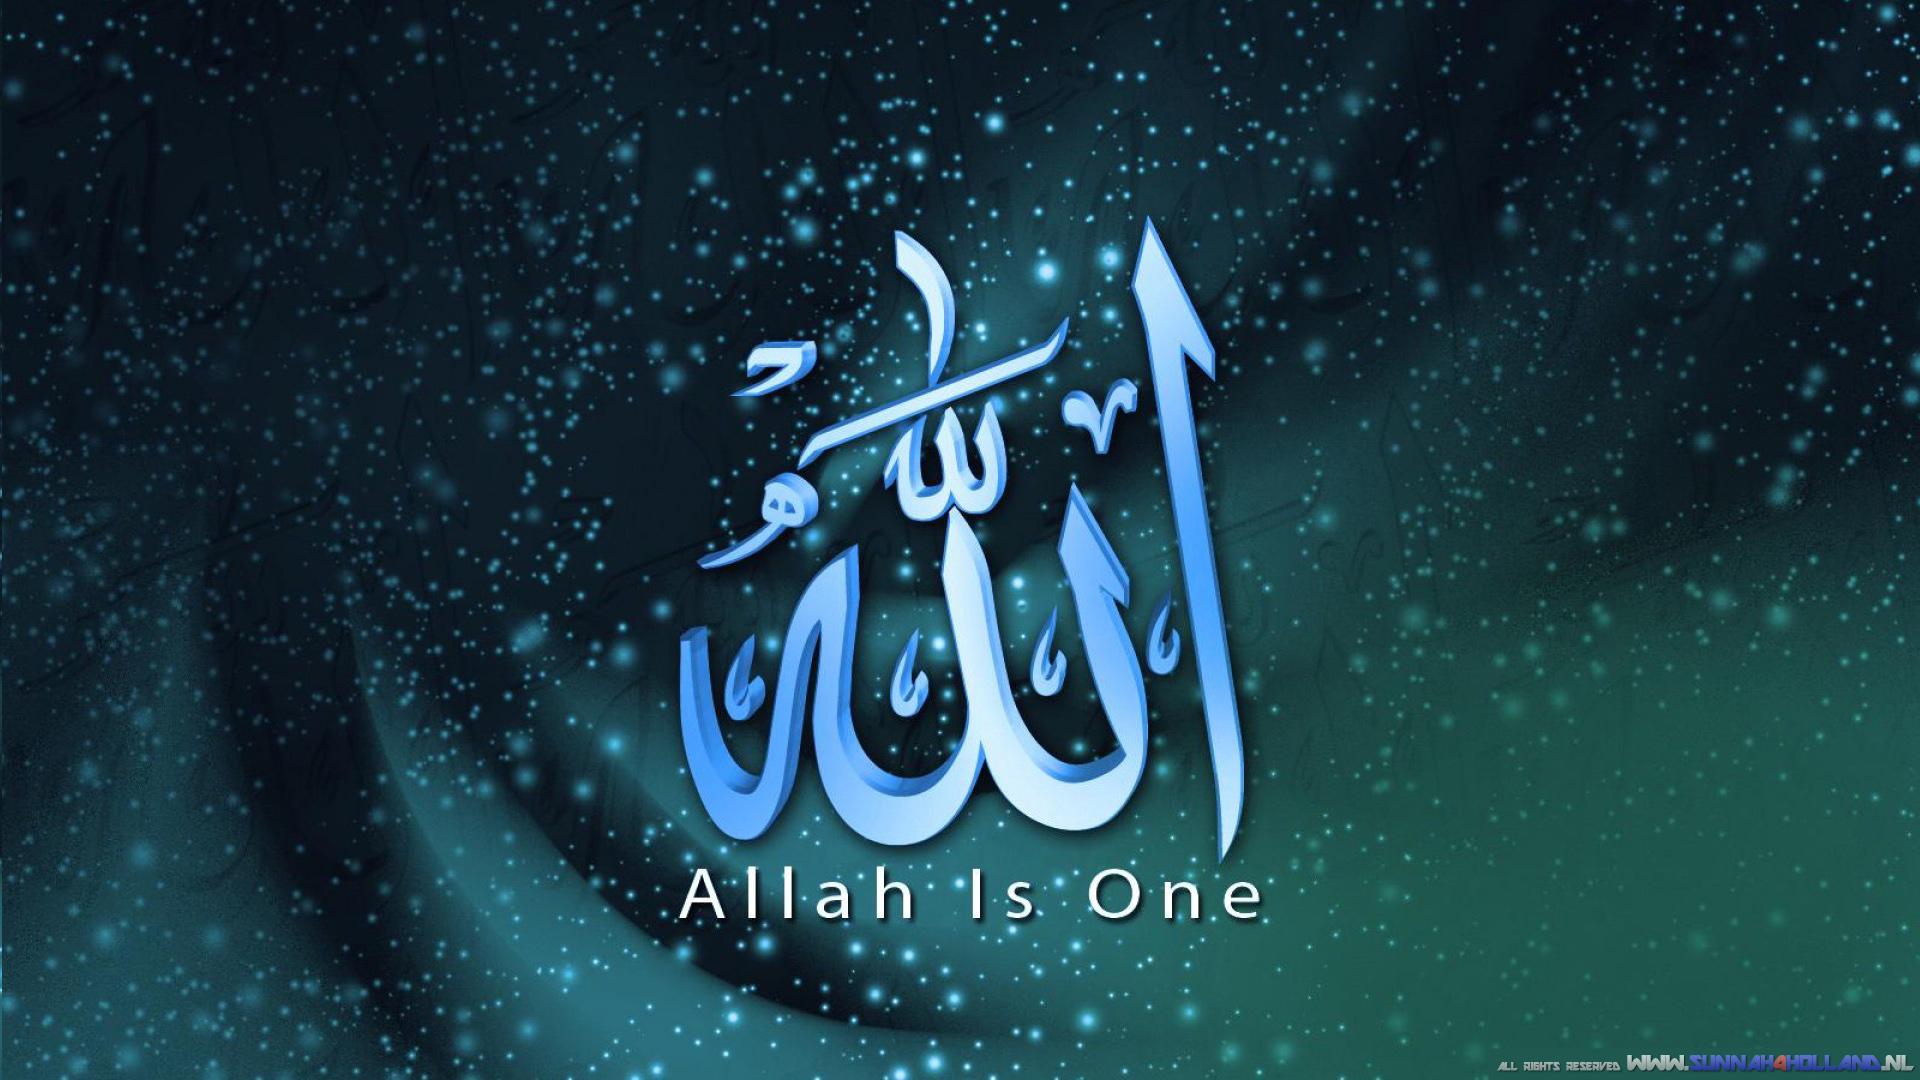 Allah Is One Wallpaper 1920X1080 HD Widescreen 1920x1080